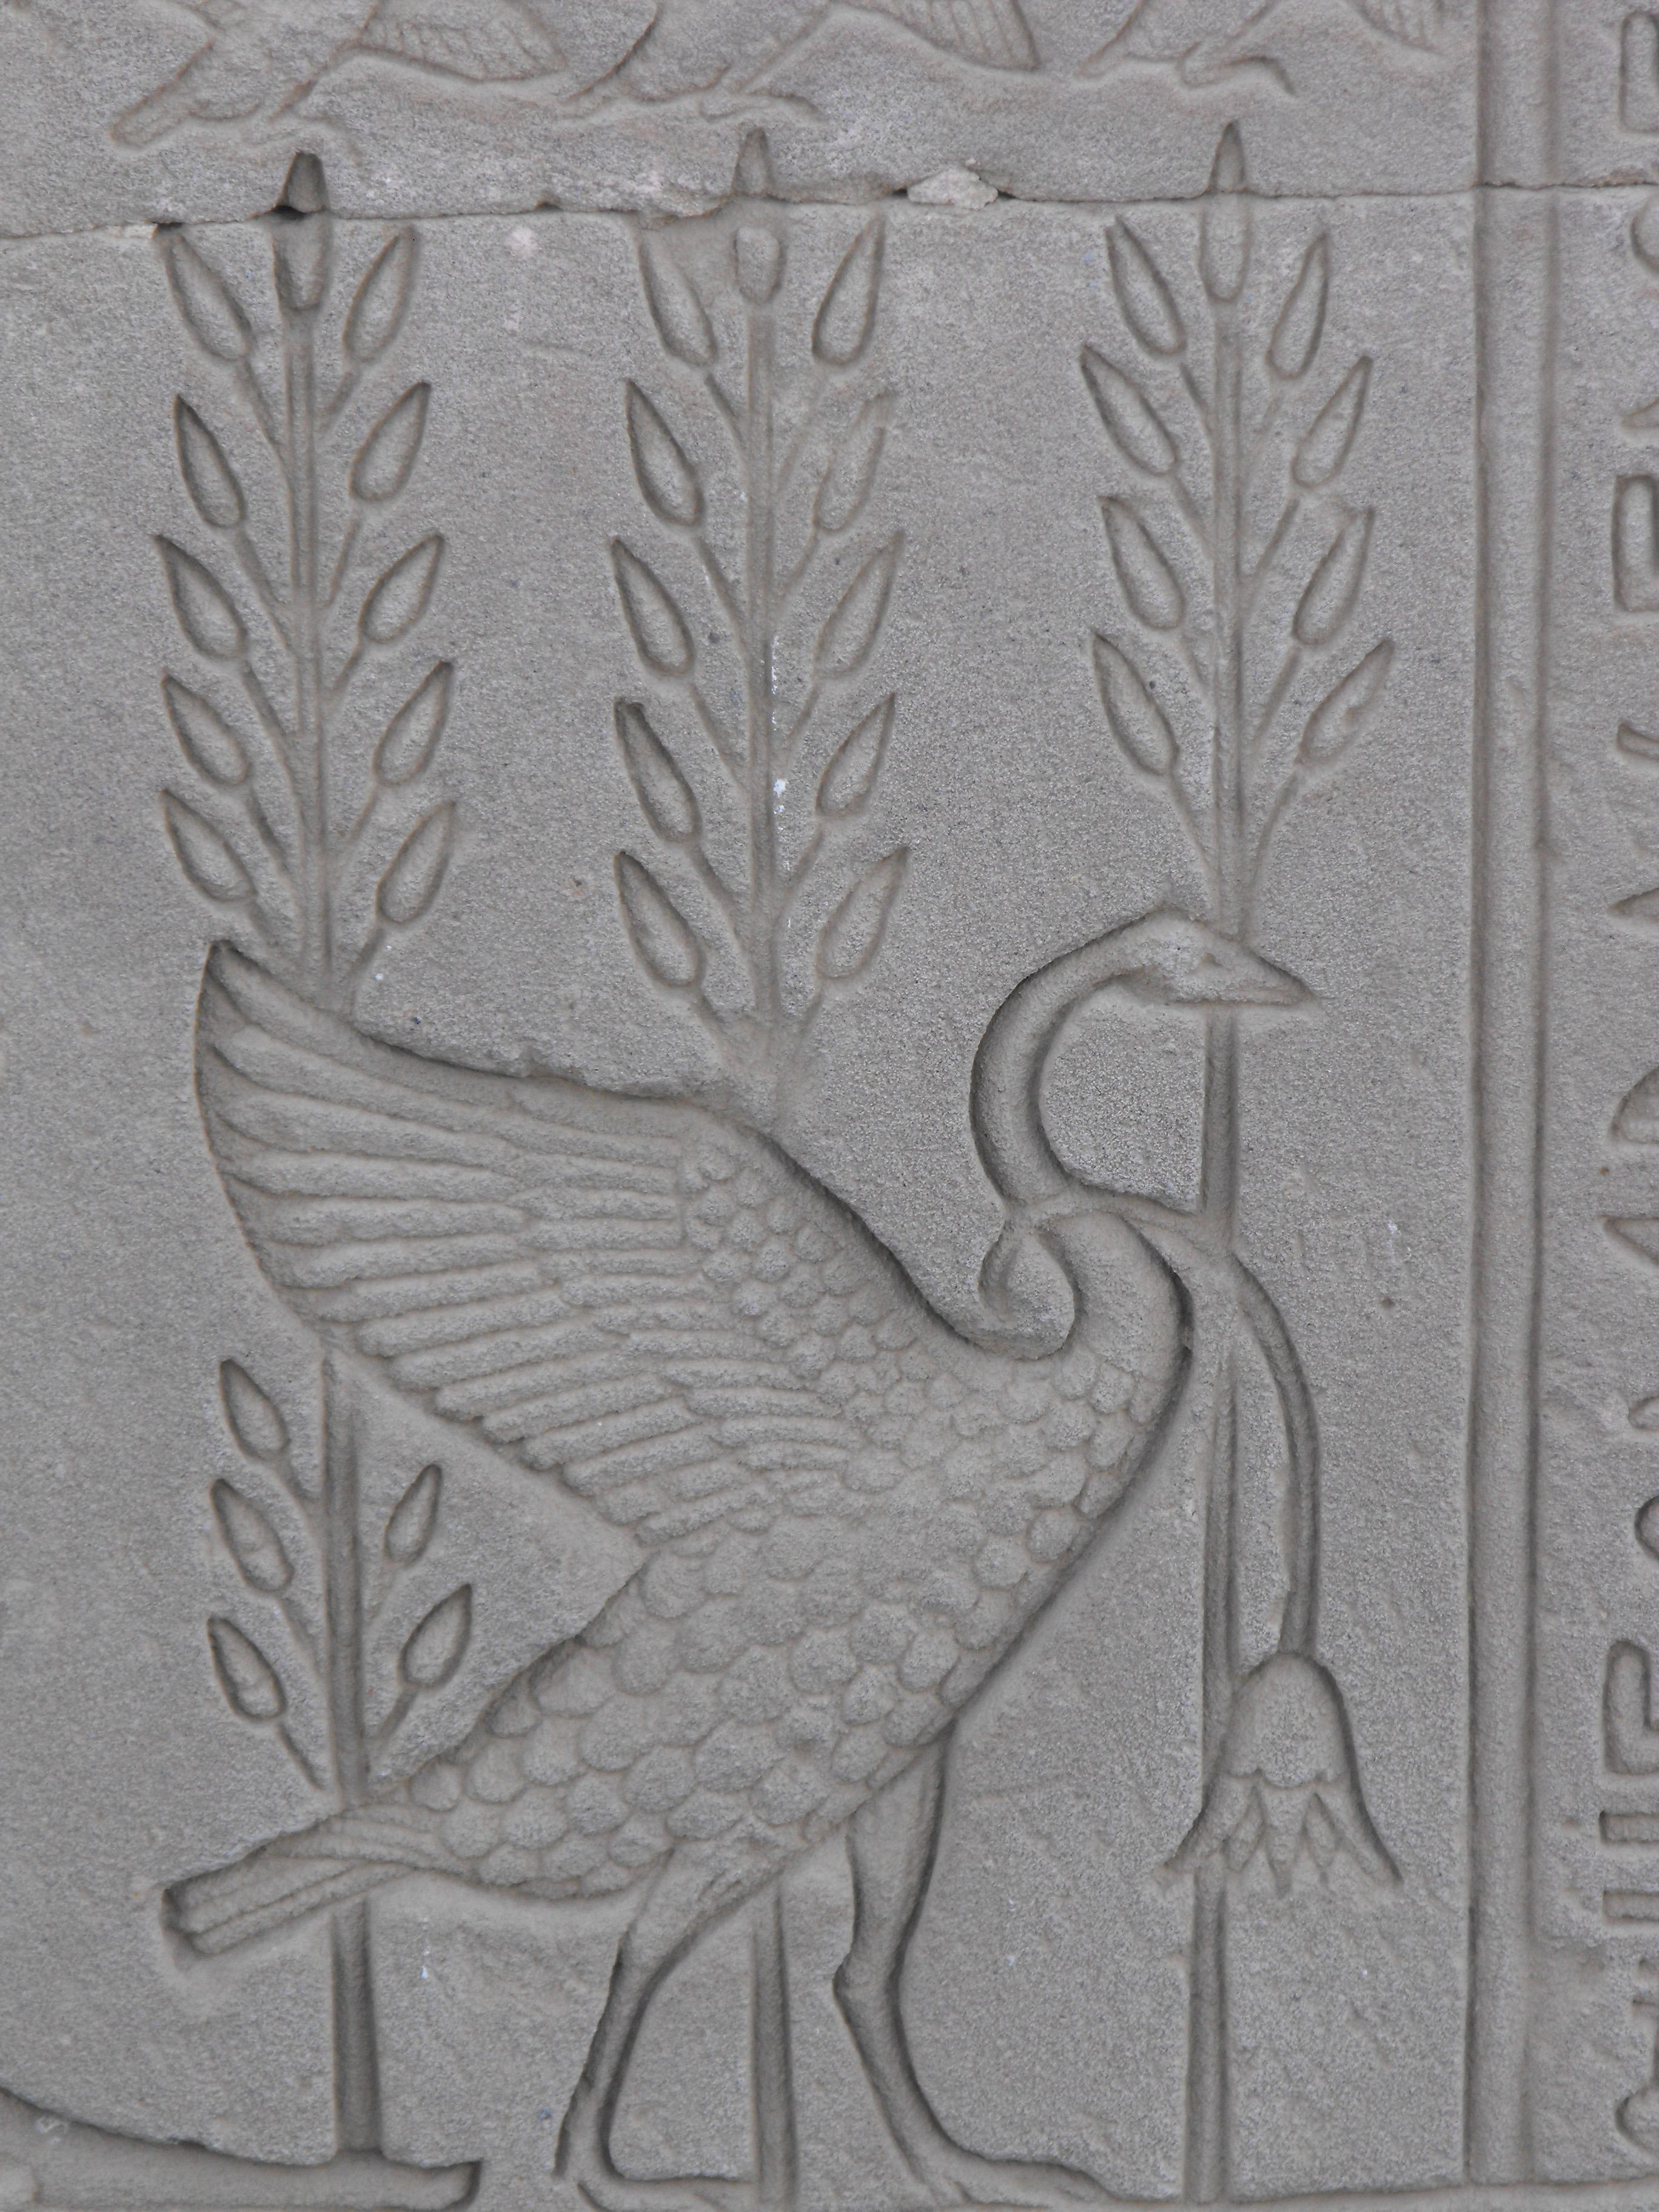 The Arrogant Goose, Hathor's Temple, Dendara, Egypt